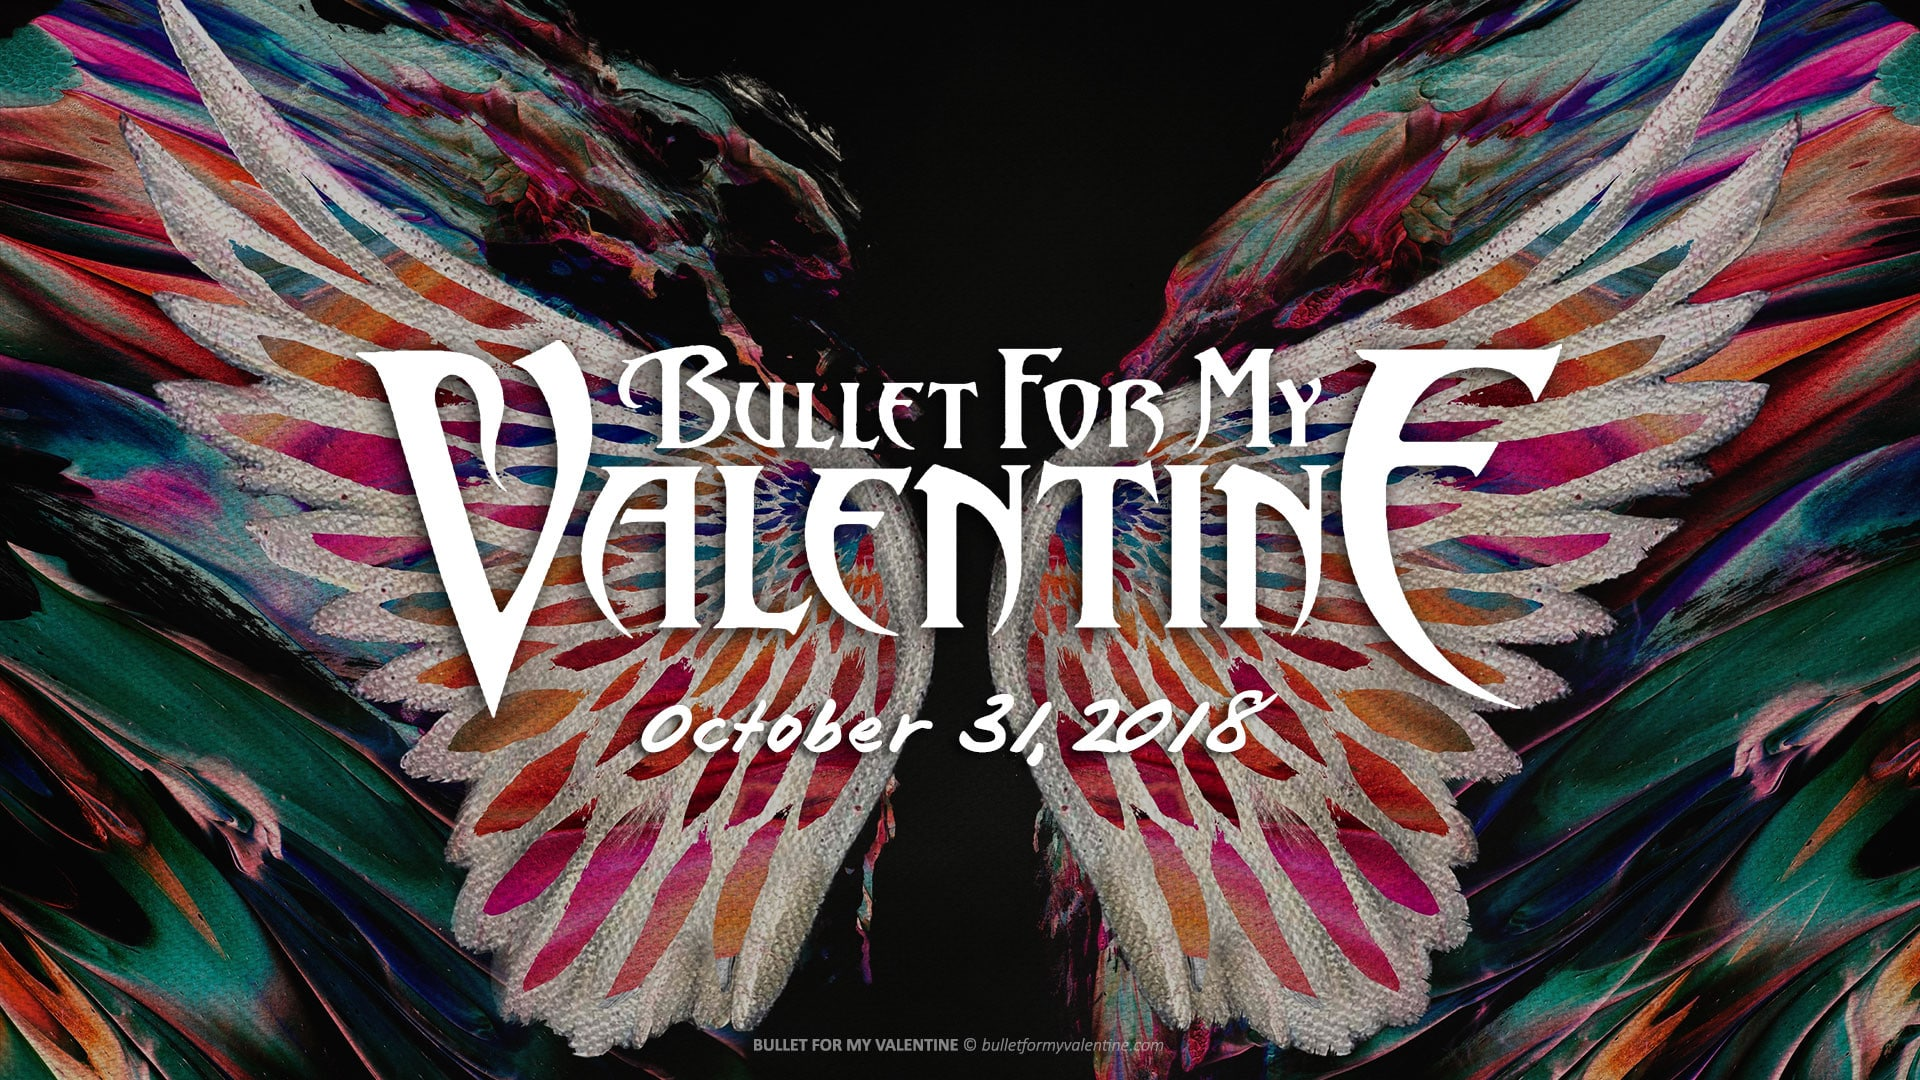 Bullet For My Valentine October 31 2018 Bologna